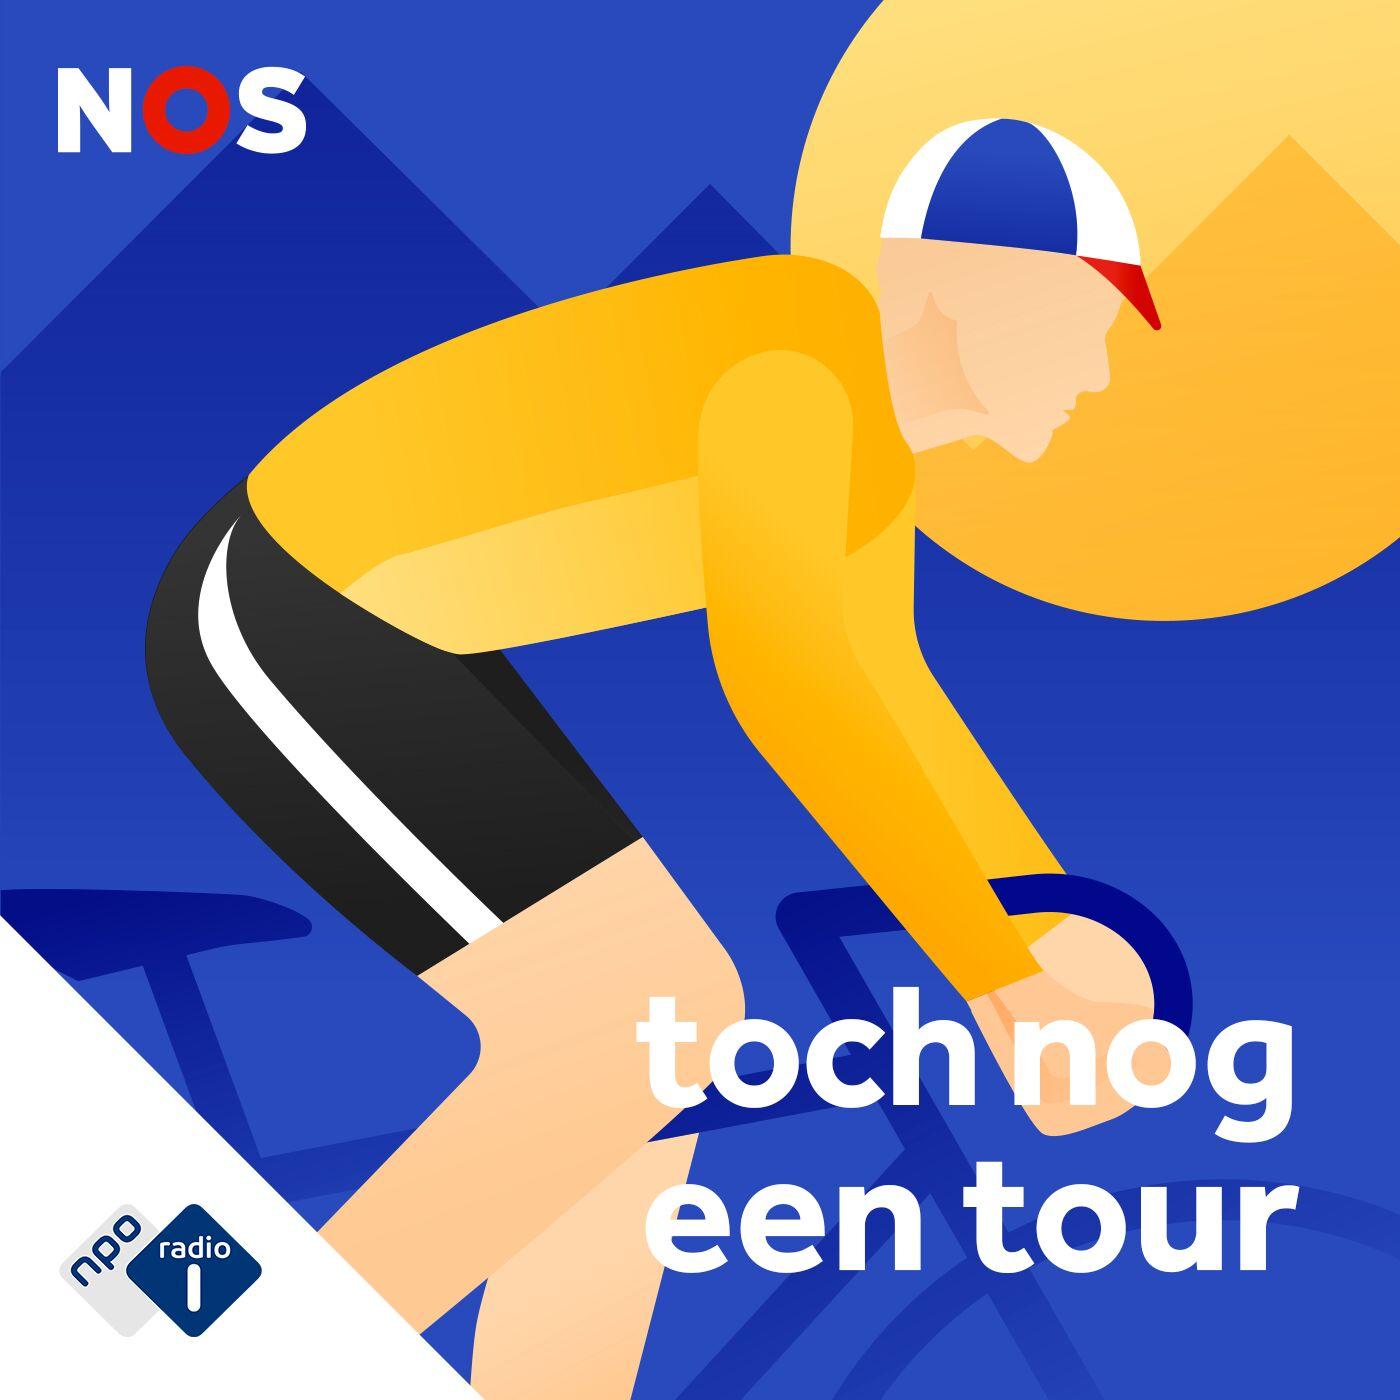 Toch nog een Tour logo